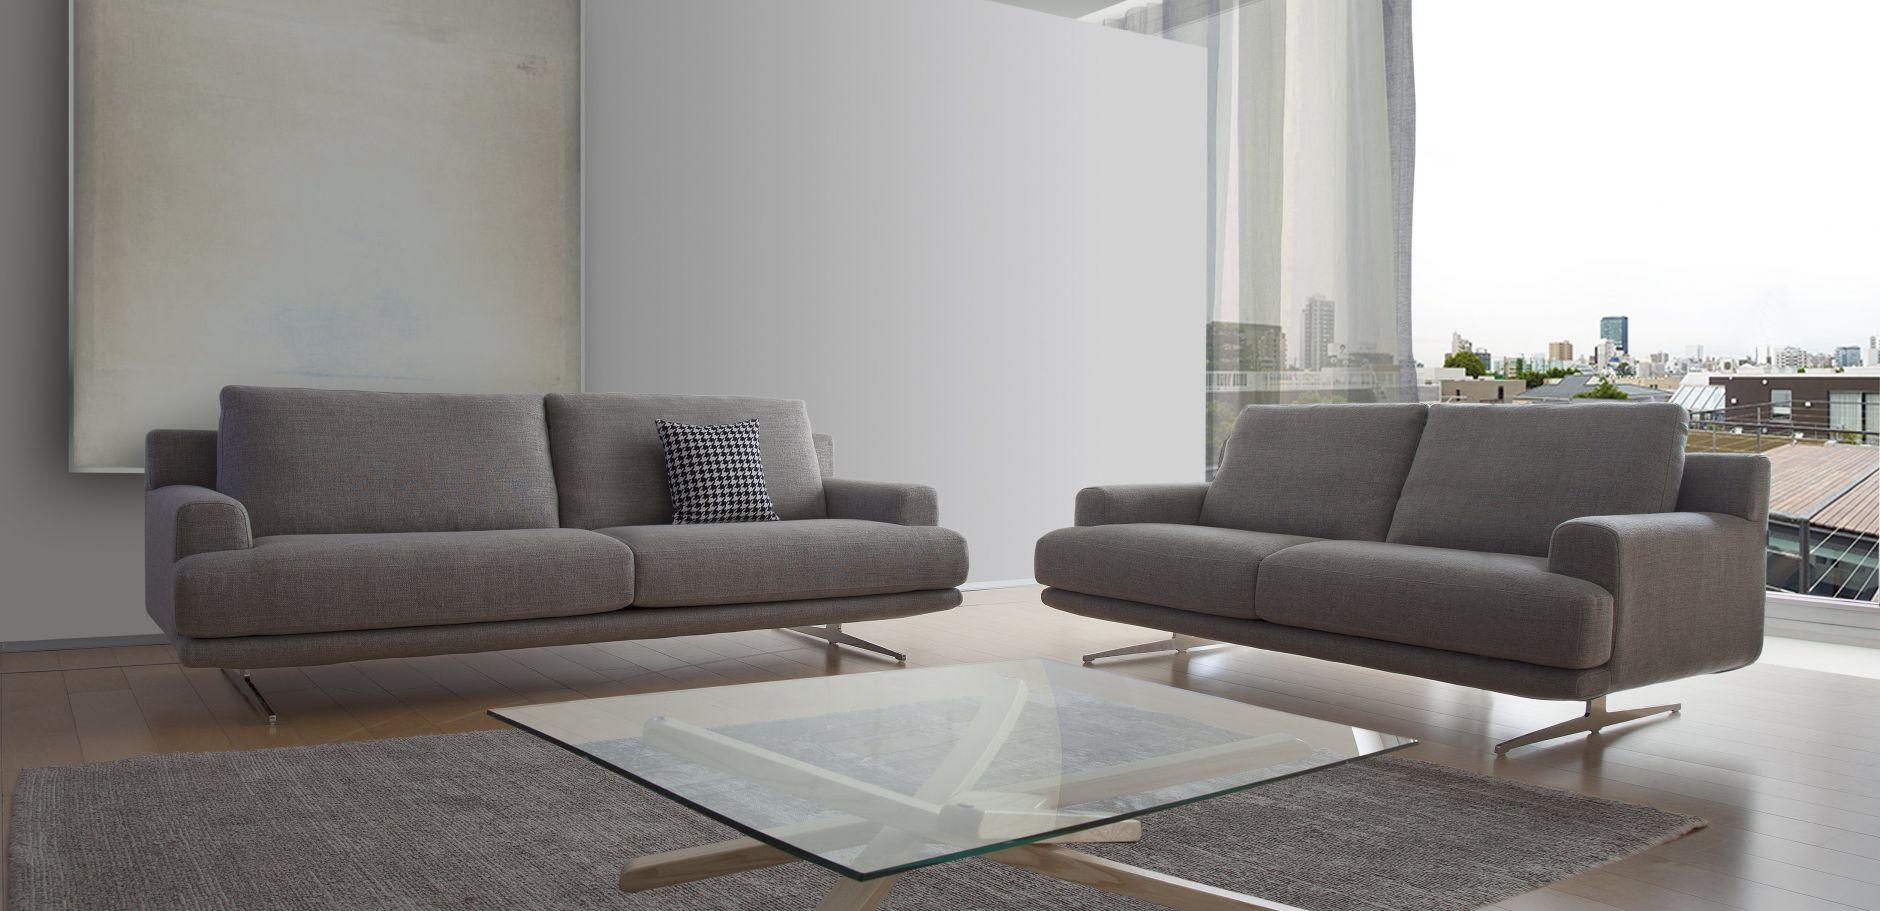 canap 233 s italiens canap 233 calia italia cosmo s 233 rie 1020 1024les meubles de l italie